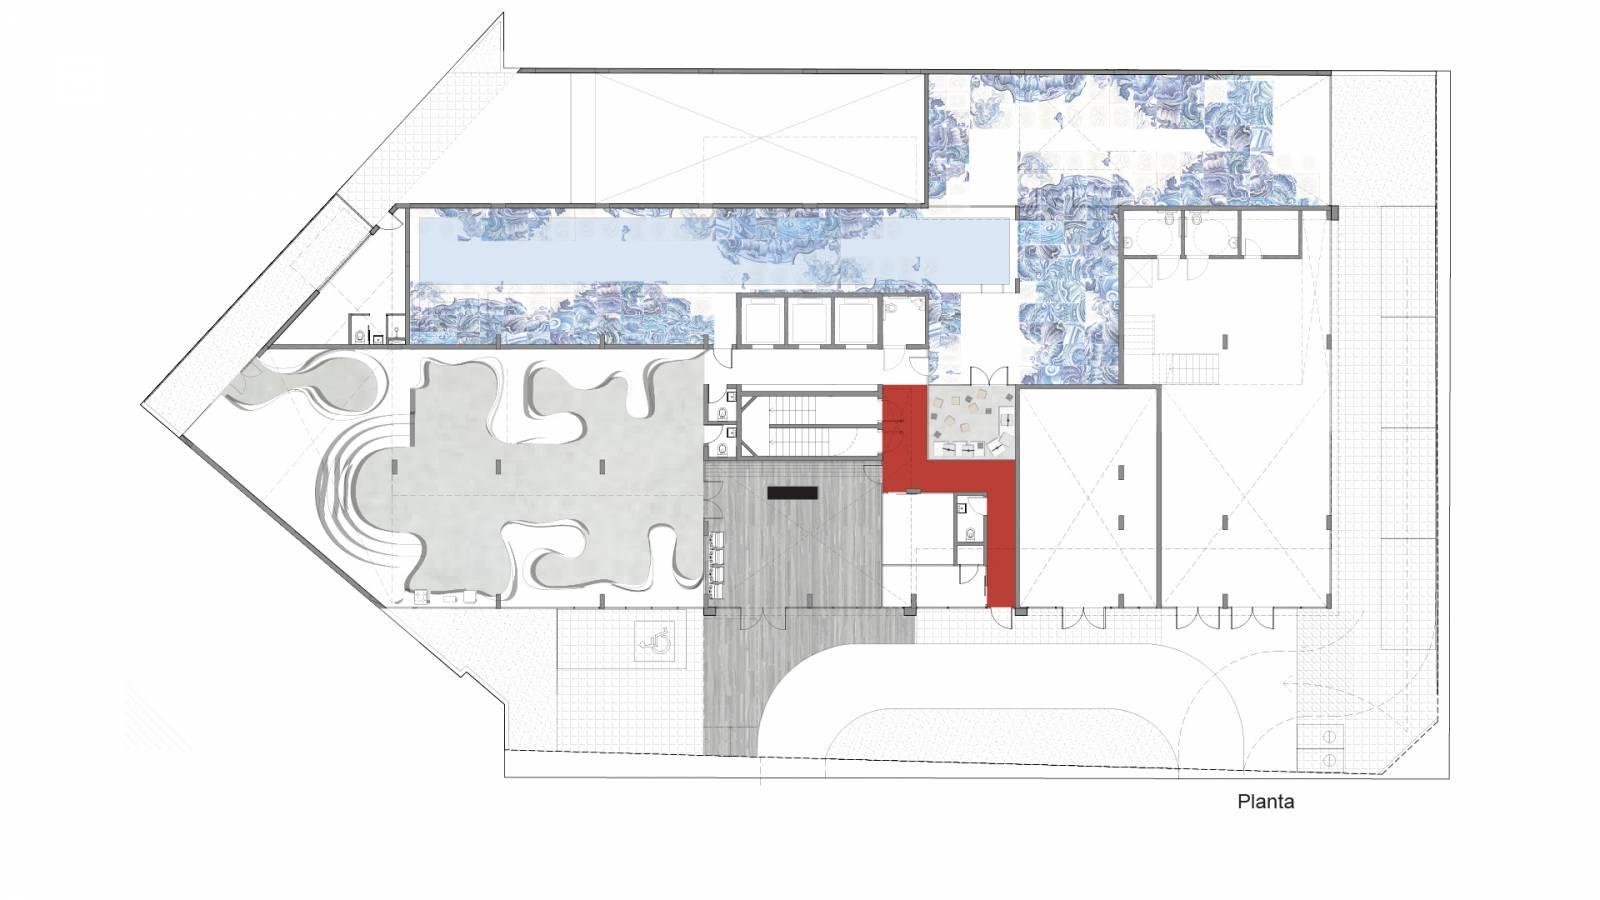 GROUND LEVEL PLAN - Fiandeiras Apartments - SPOL Architects